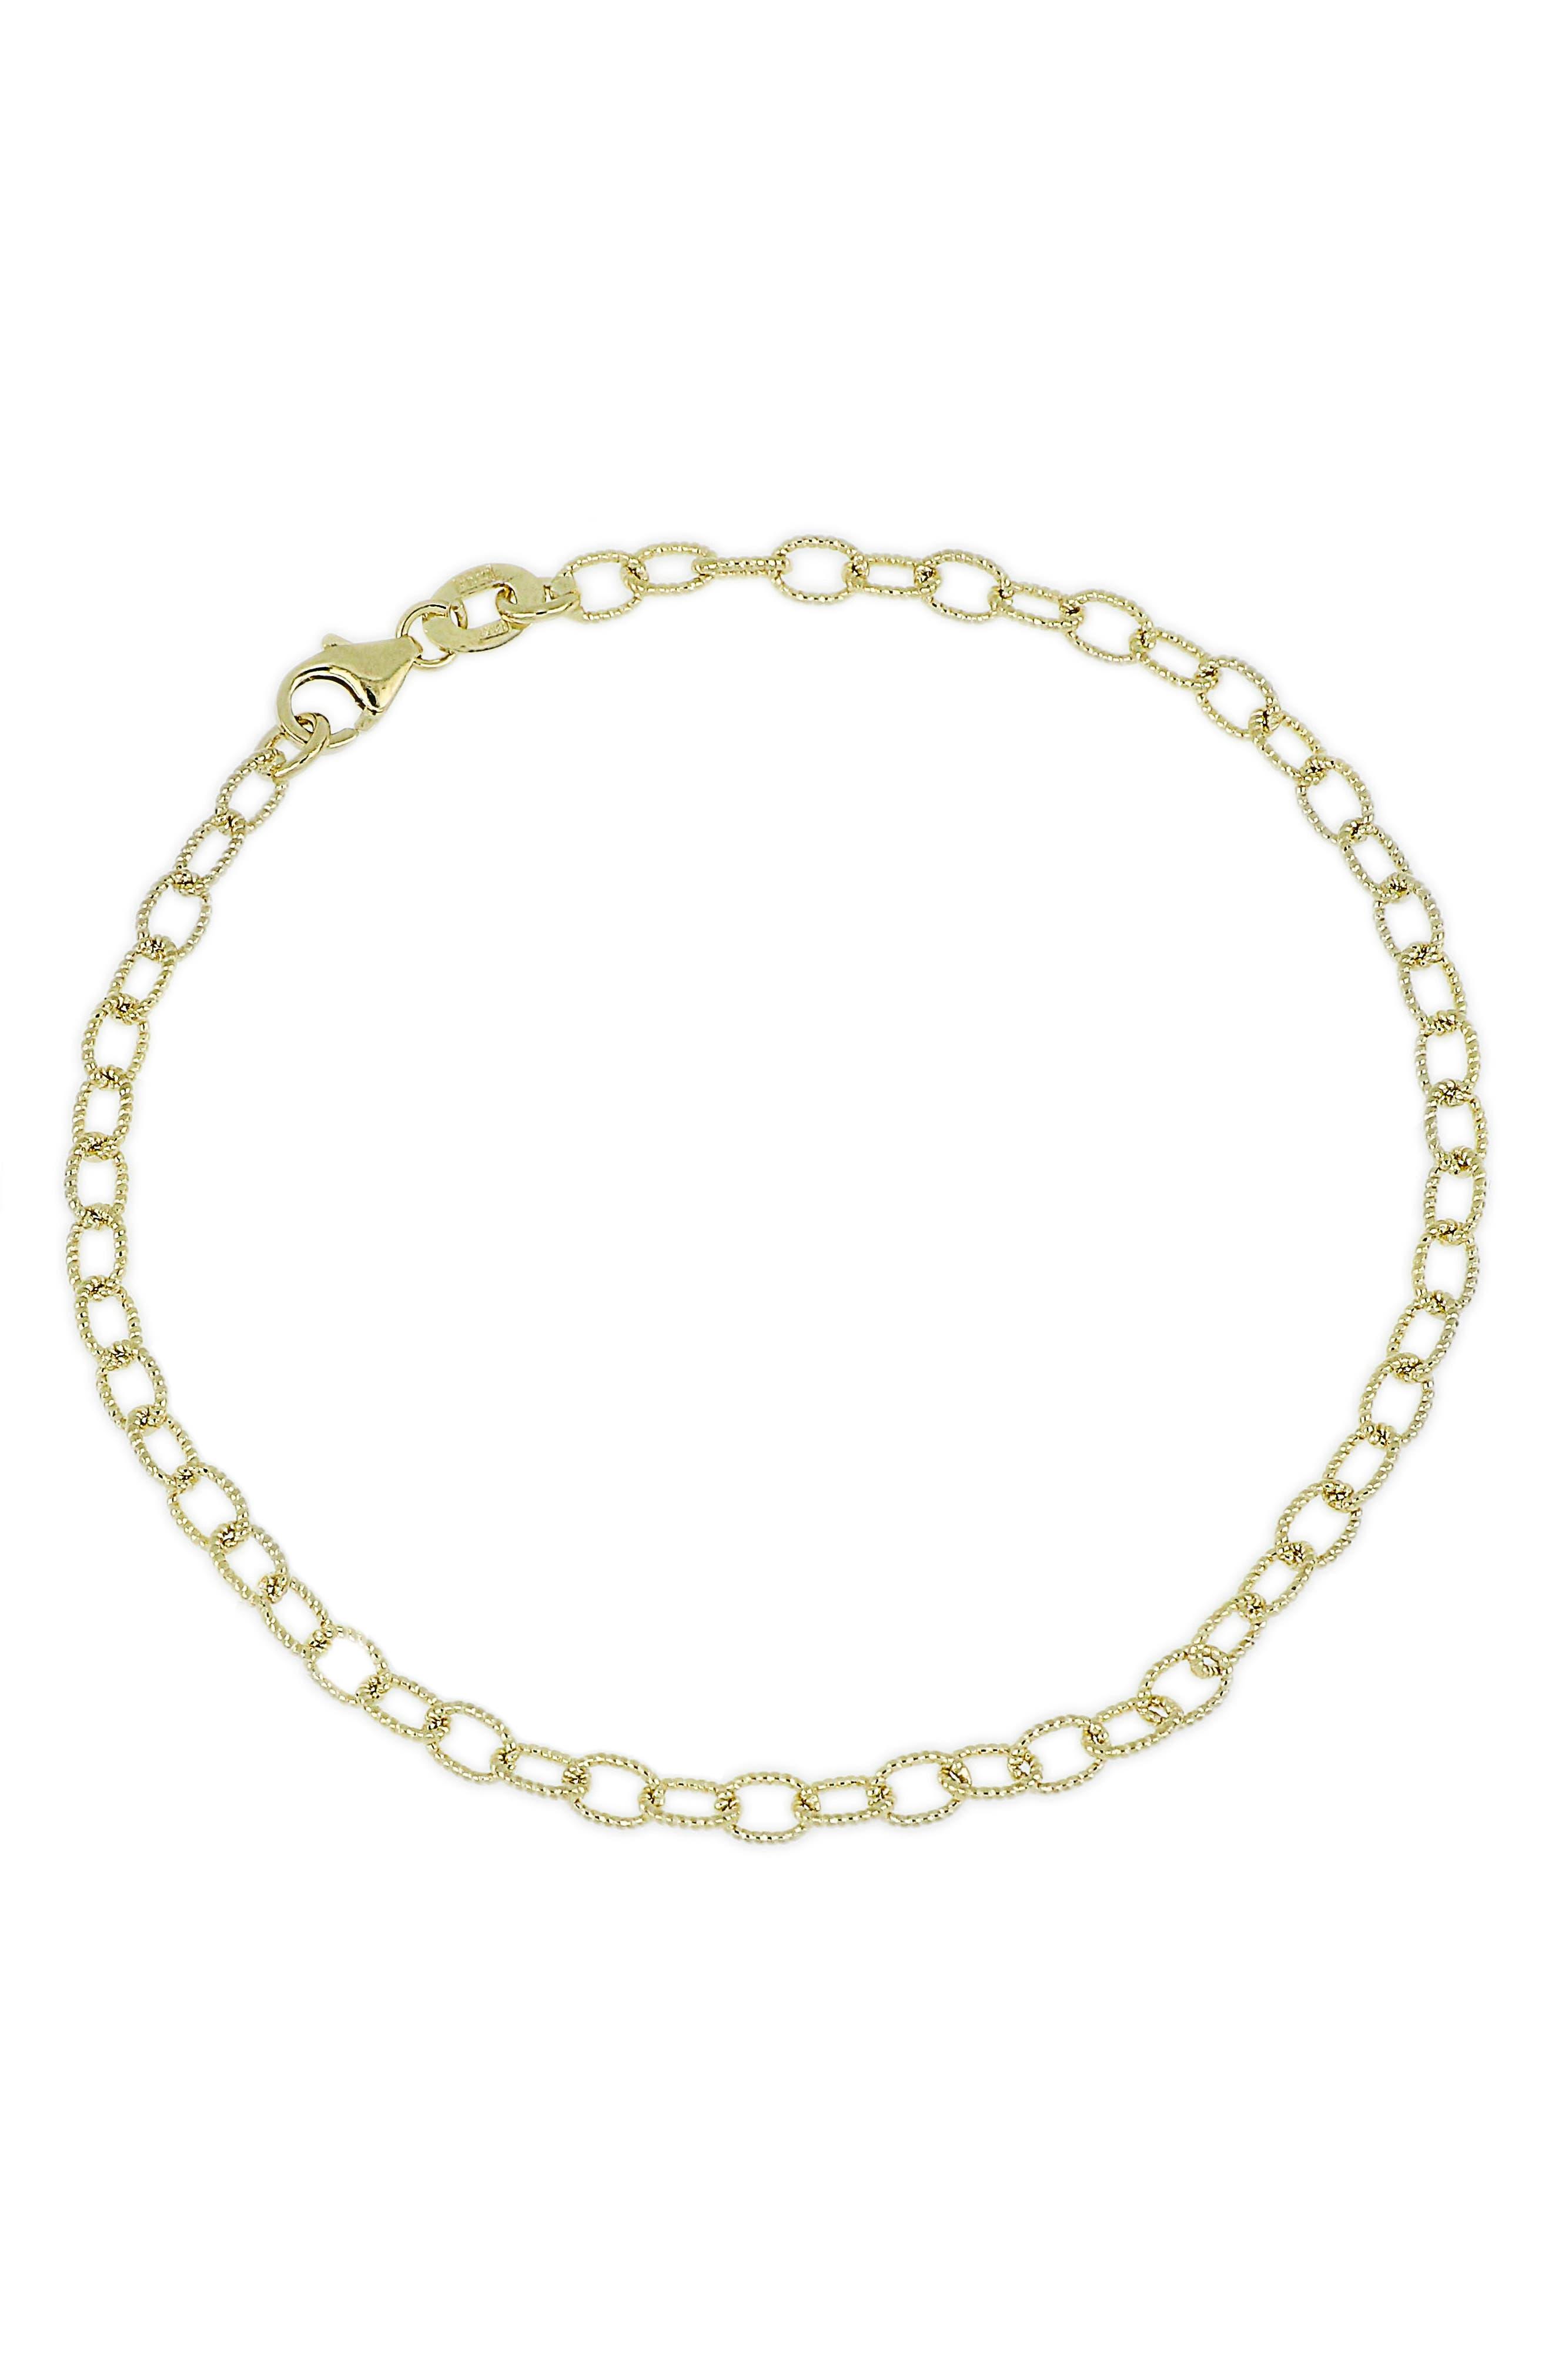 14k Gold Link Charm Bracelet,                         Main,                         color, Yellow Gold